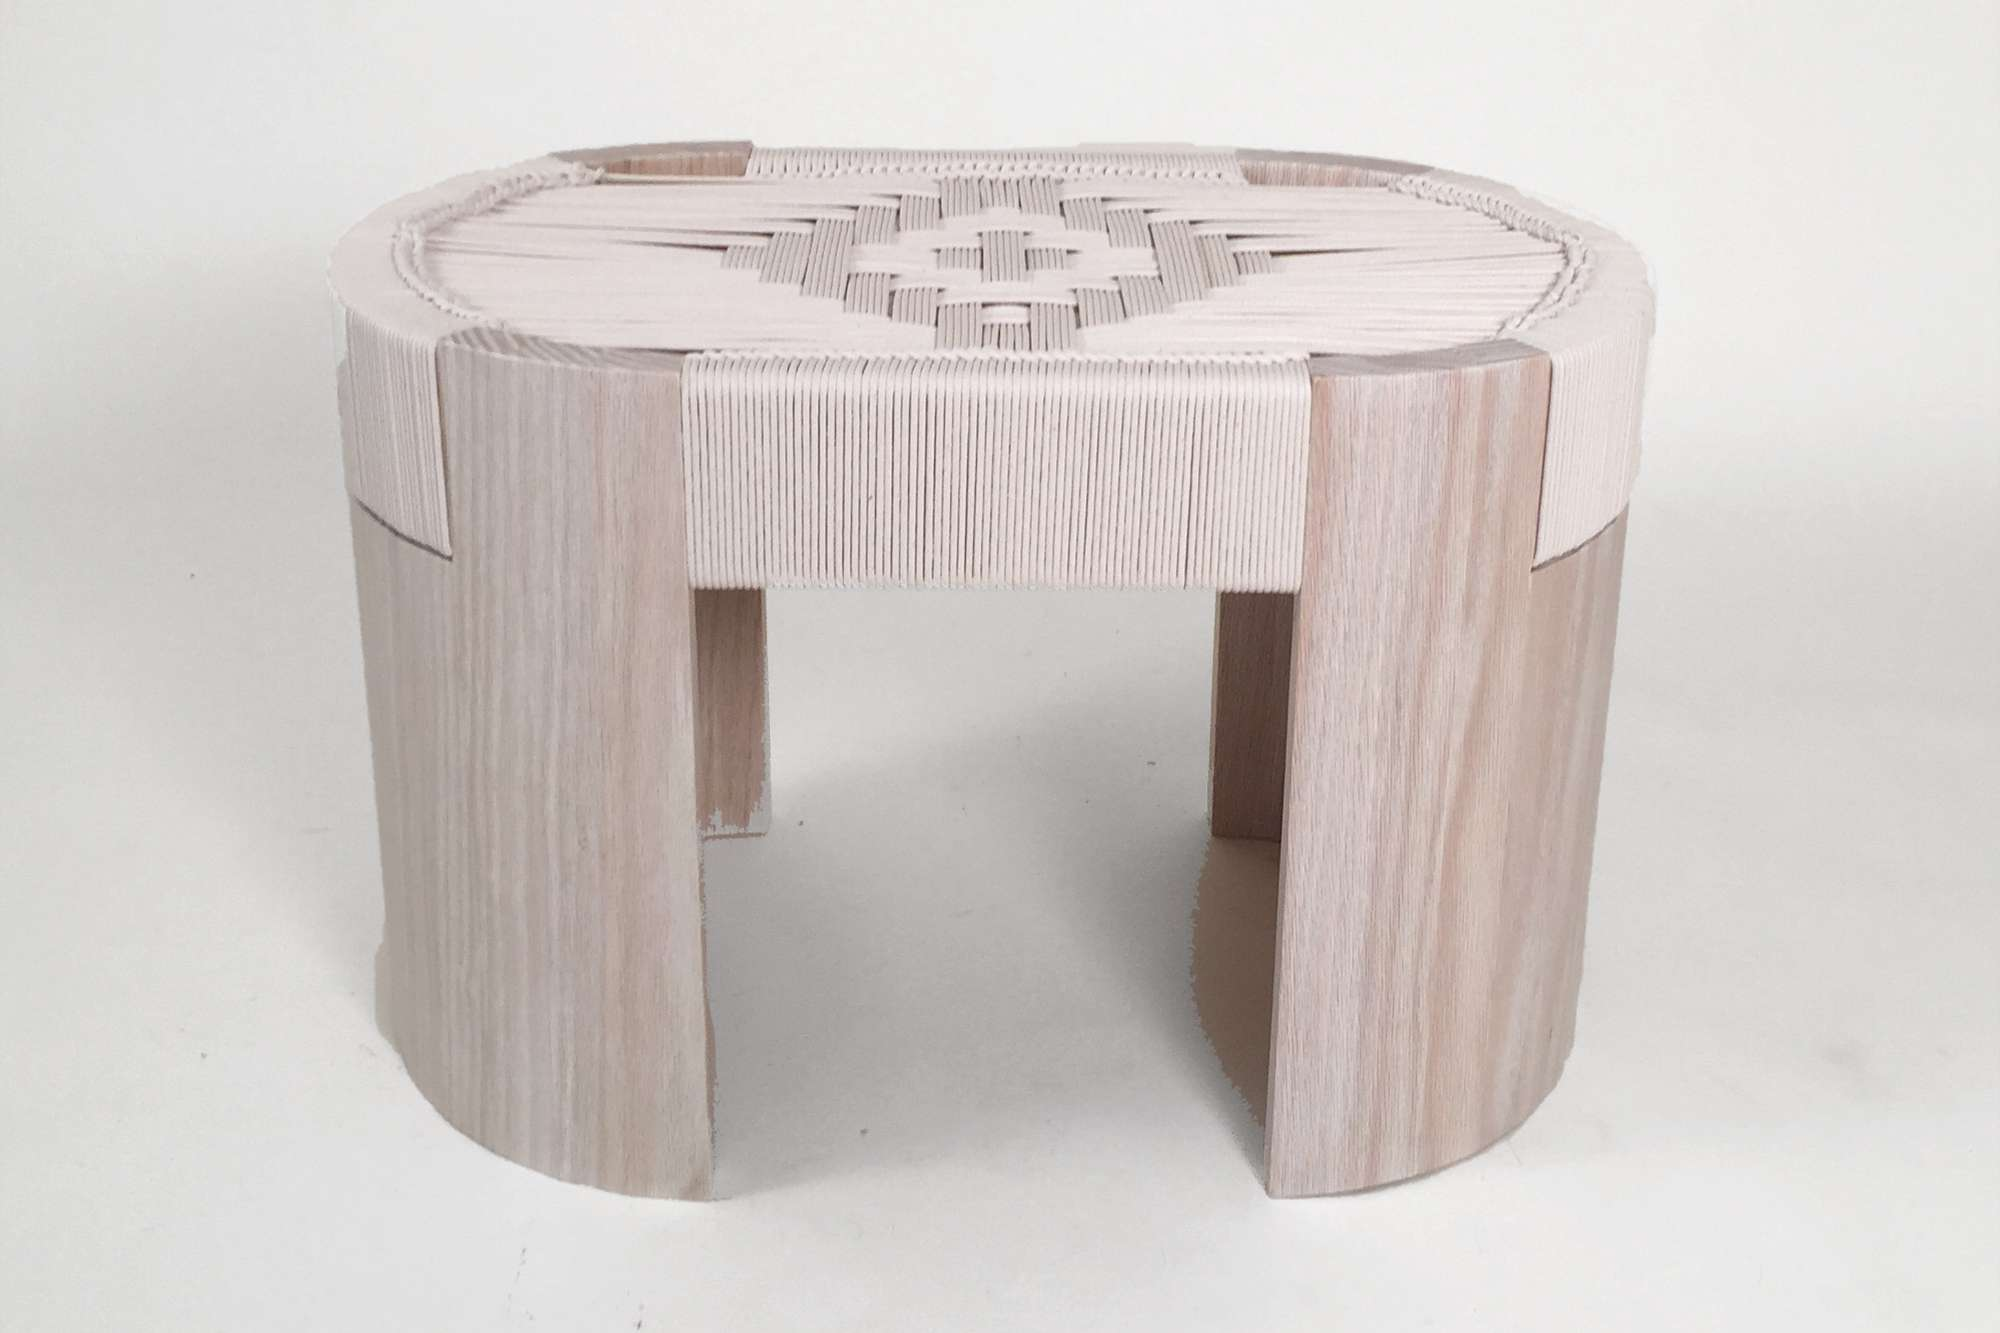 euclid bench31.jpg